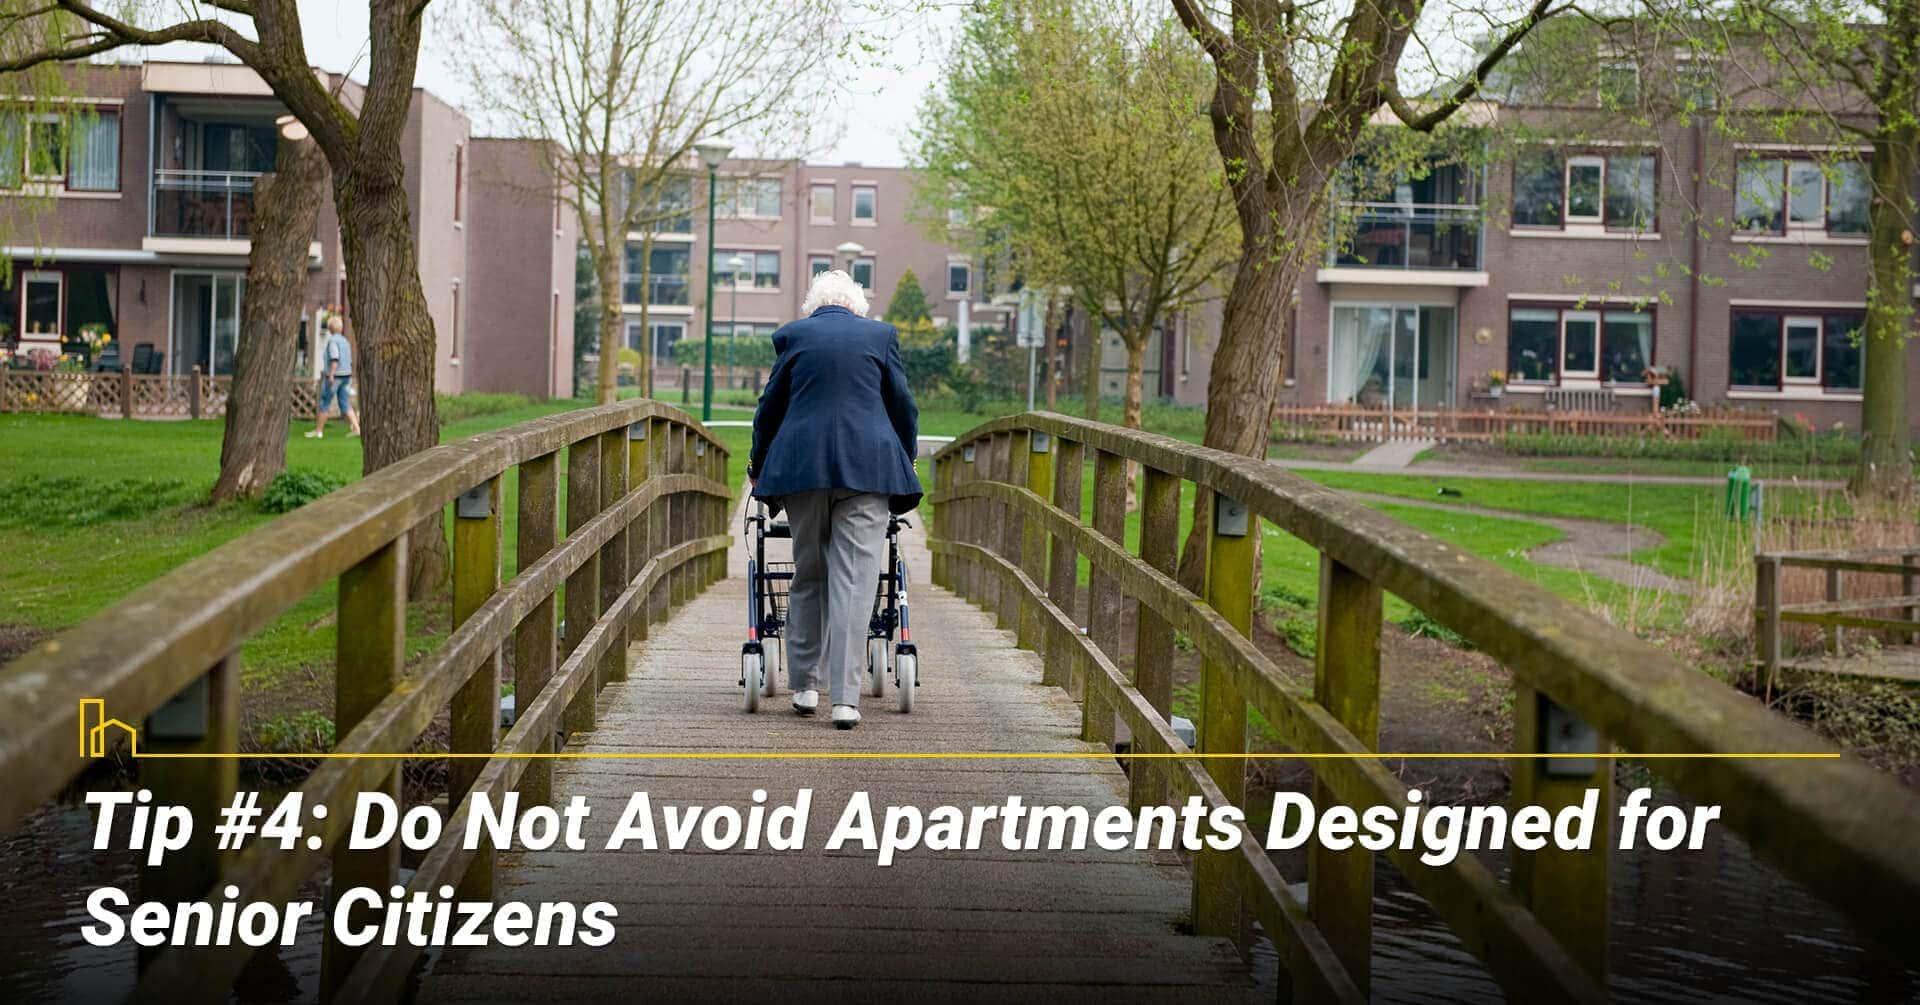 Tip #4: Do Not Avoid Apartments Designed for Senior Citizens, can be in senior apartment